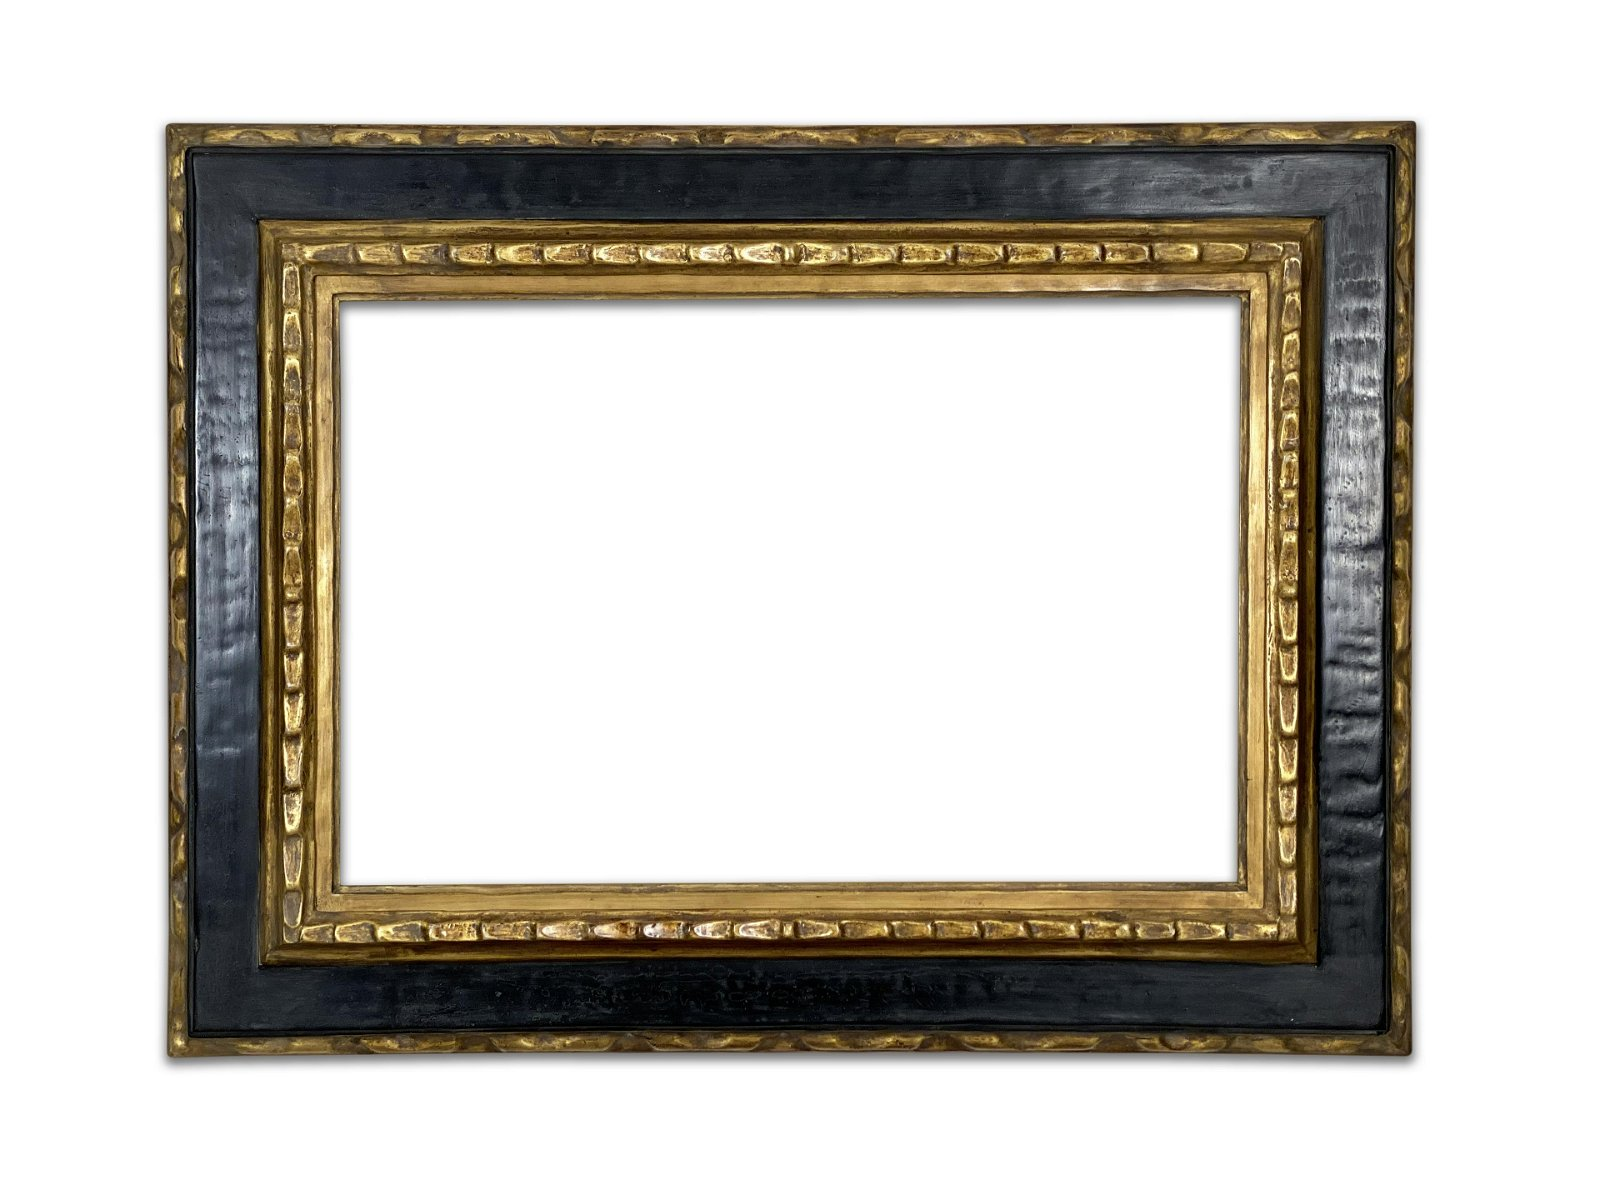 Eli Wilner Frame,19th Century Style Ex. Picasso